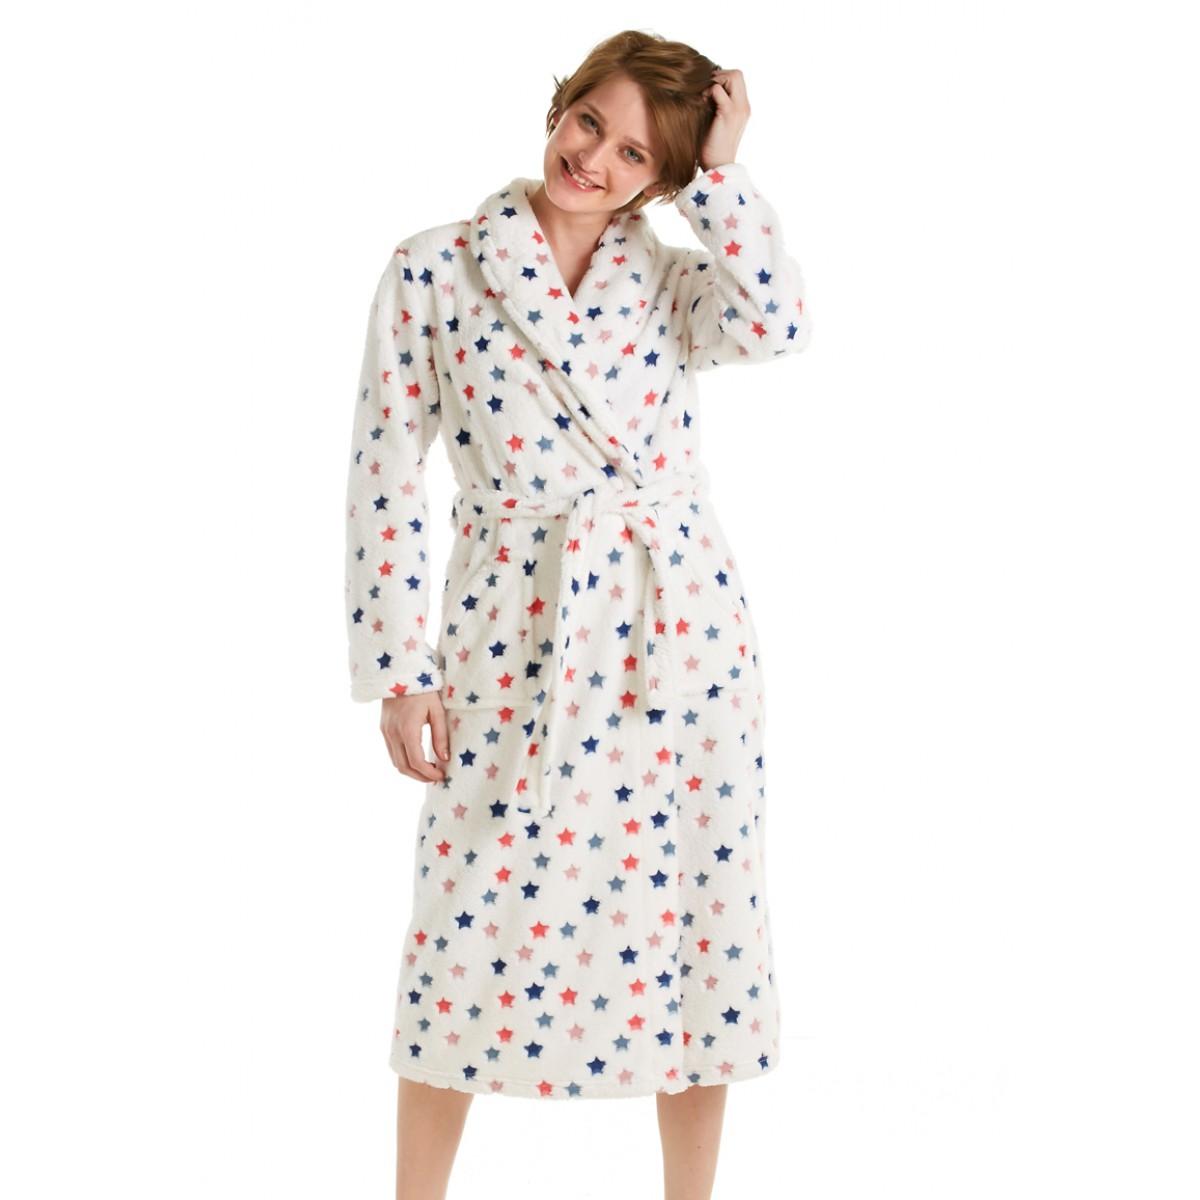 dames badjas kopen